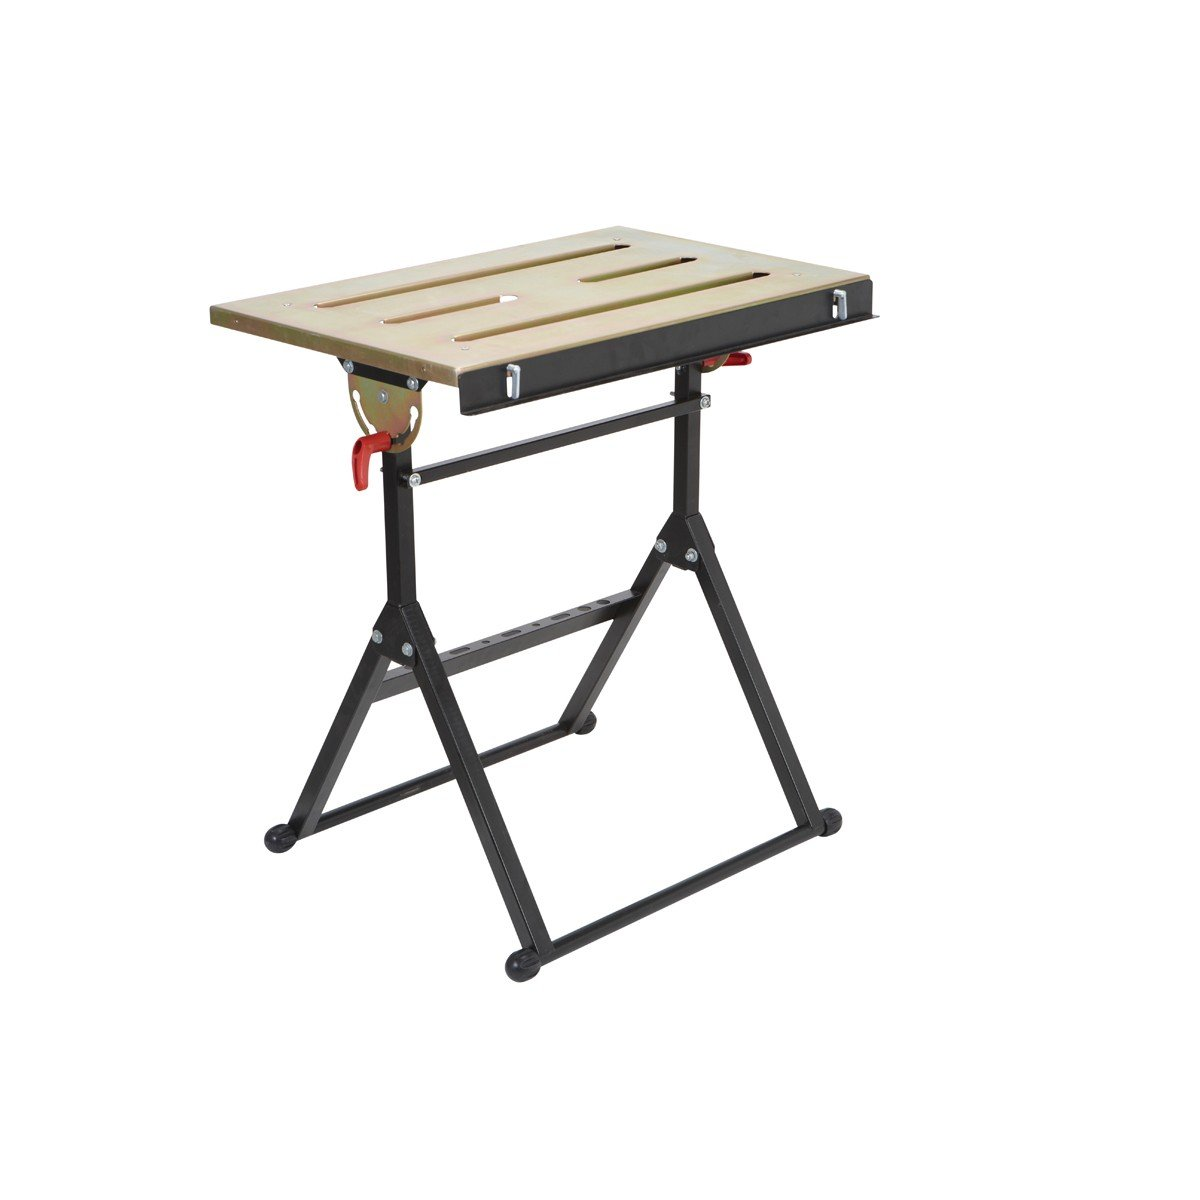 Chicago Electric Adjustable Steel Welding Tables